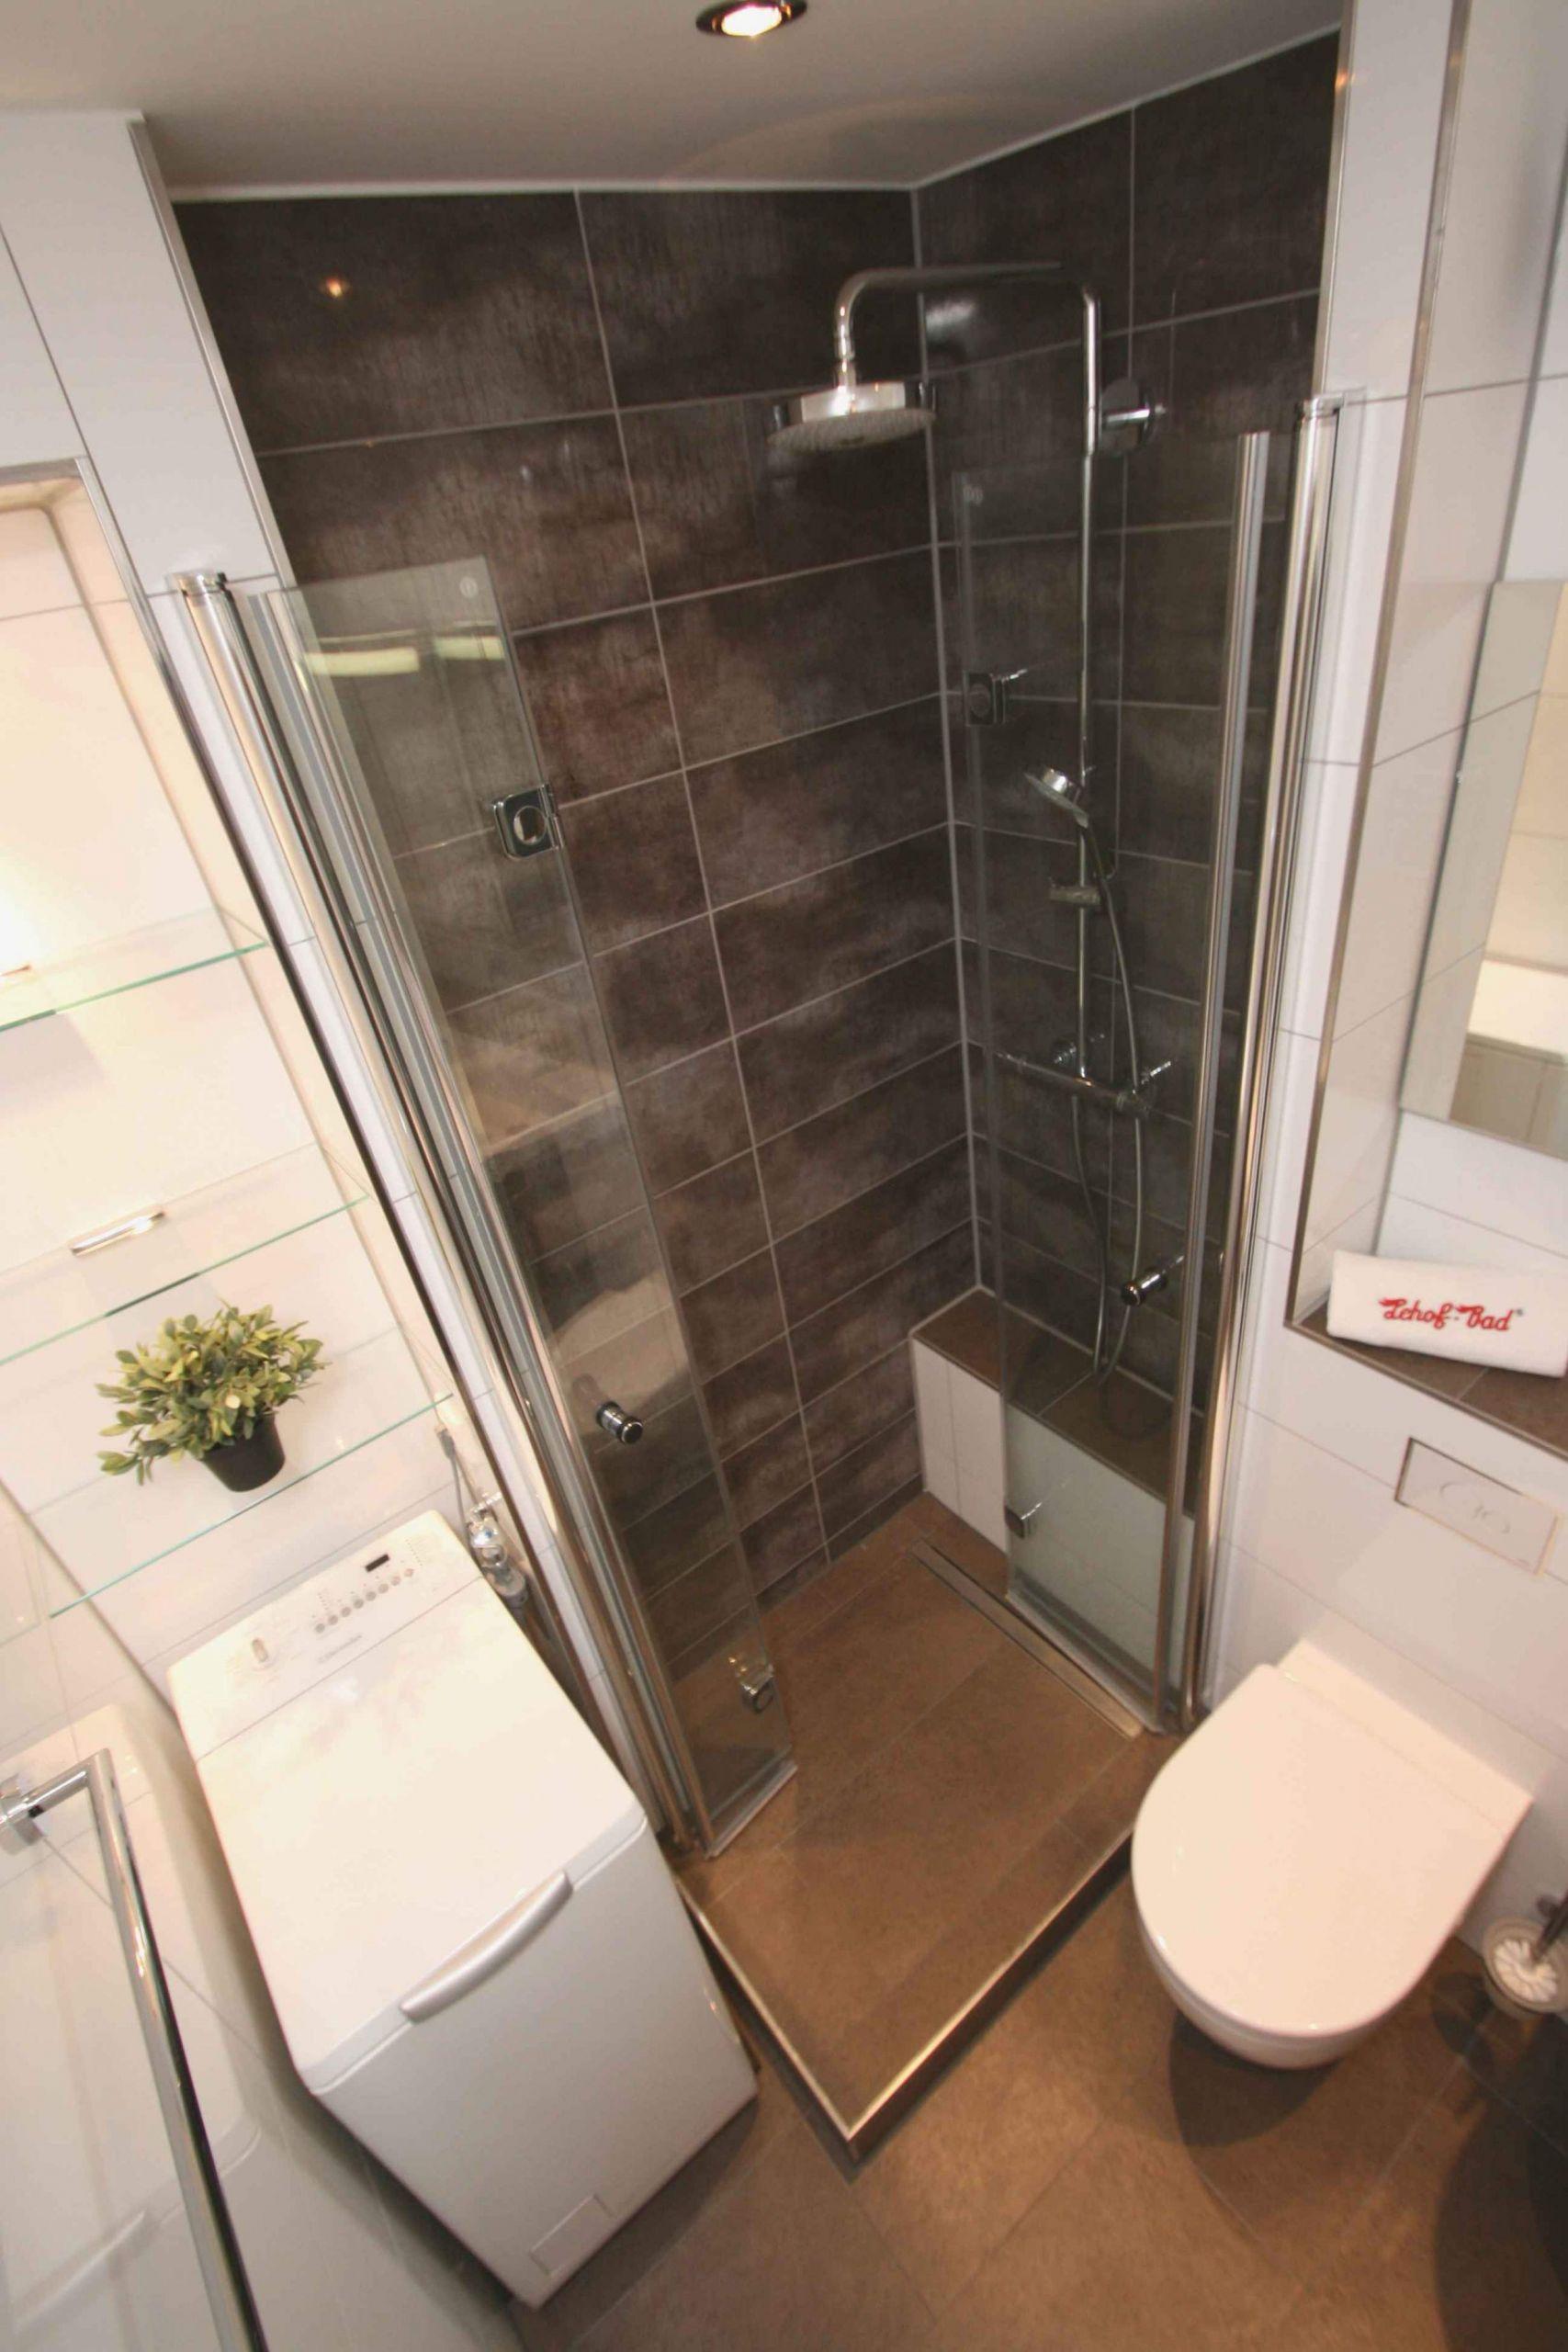 36 hervorragende grose badewanne badewanne am fenster badewanne am fenster 1